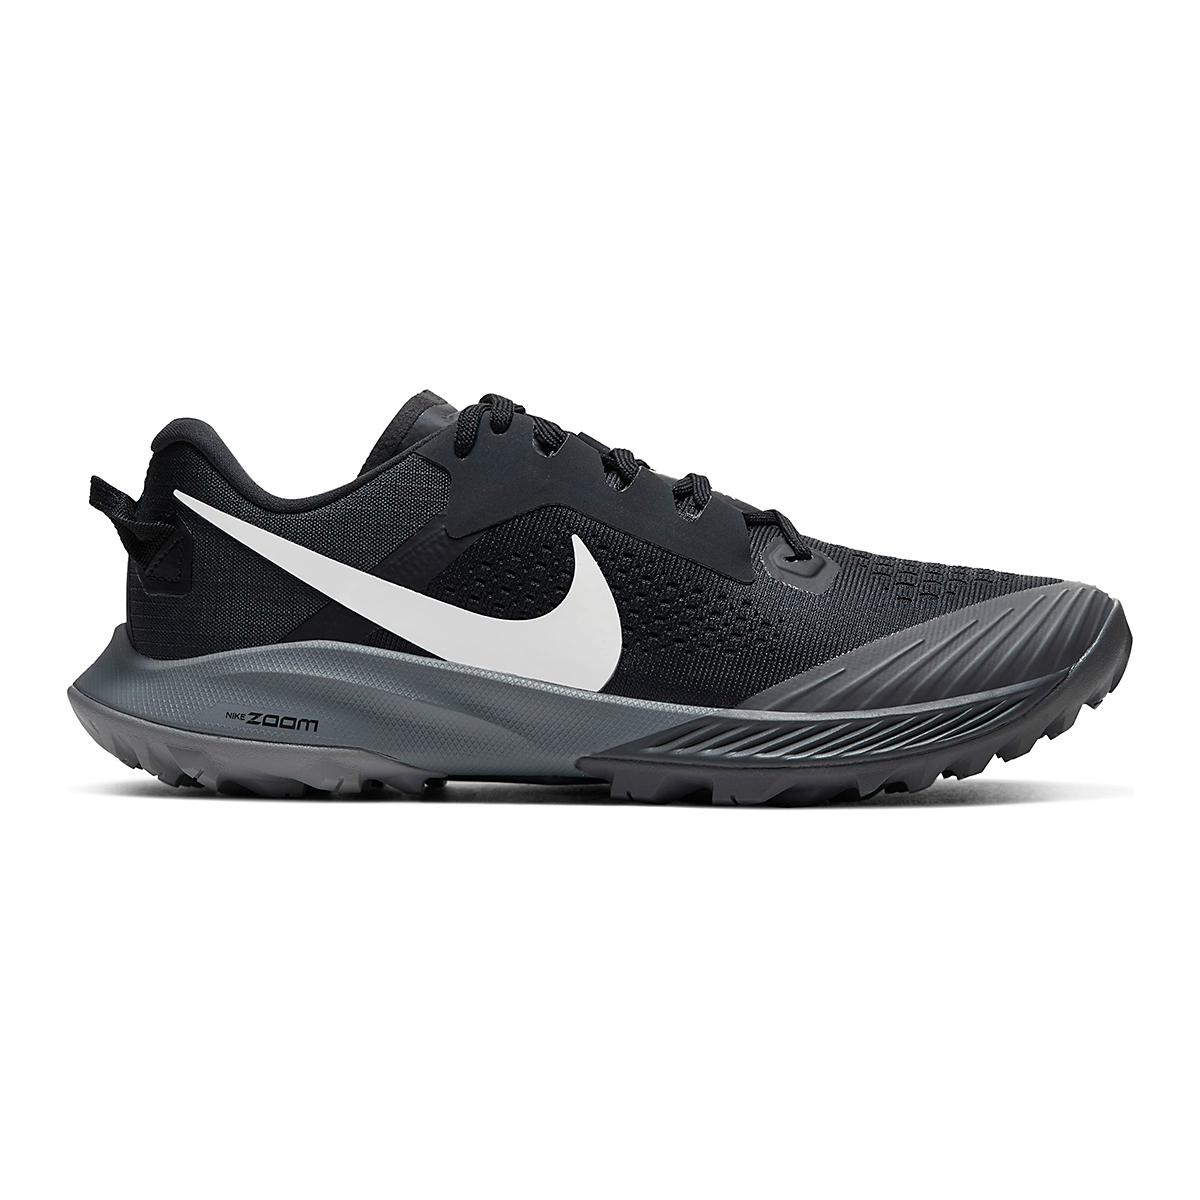 Women's Nike Air Zoom Terra Kiger 6 Trail Running Shoe - Color: Off Noir/Black/Iron Grey/Spruce Aura - Size: 5 - Width: Regular, Off Noir/Black/Iron Grey/Spruce Aura, large, image 1